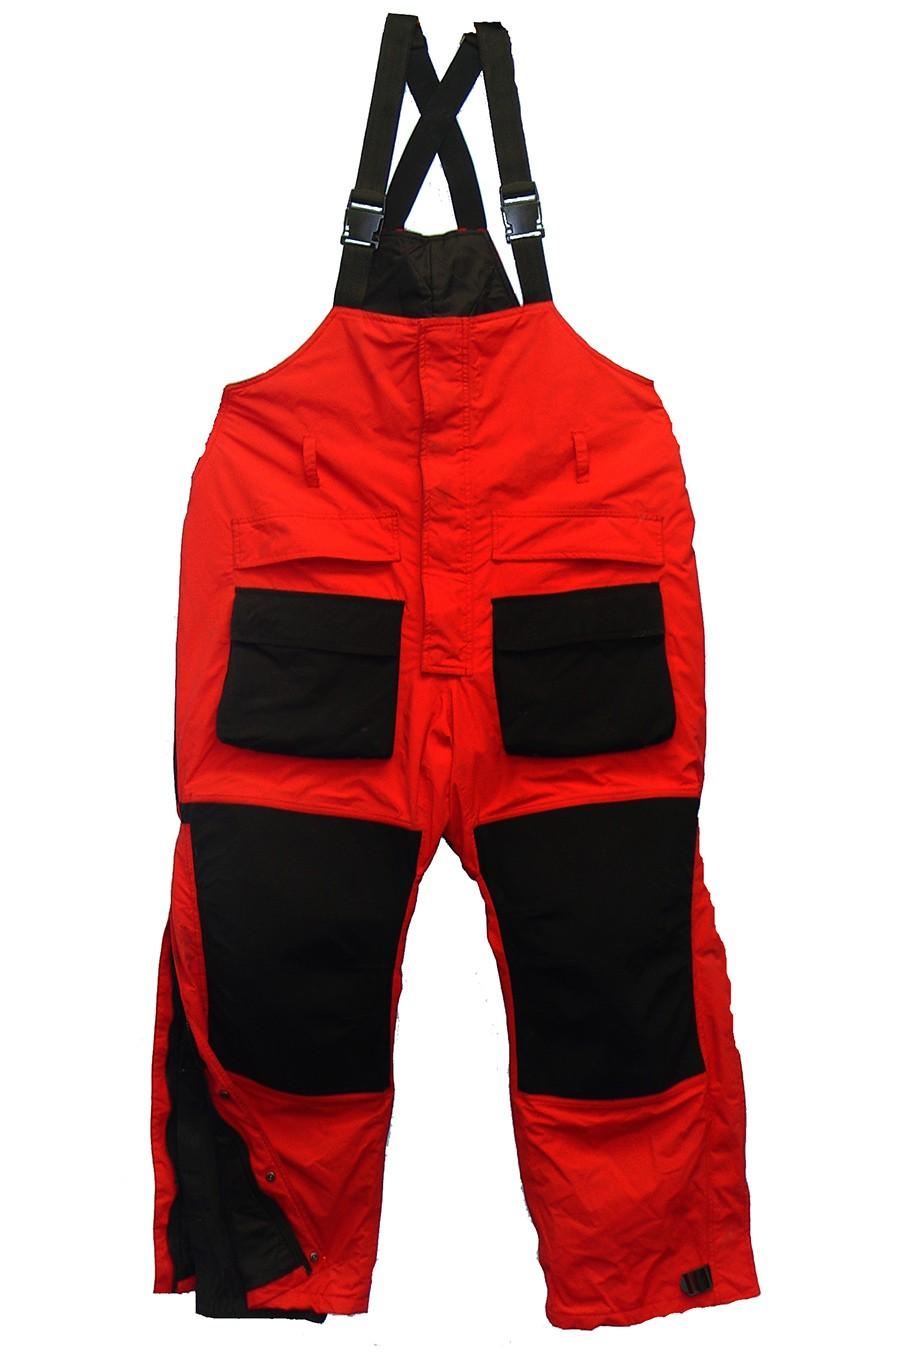 Arctic Armor Red Bibs